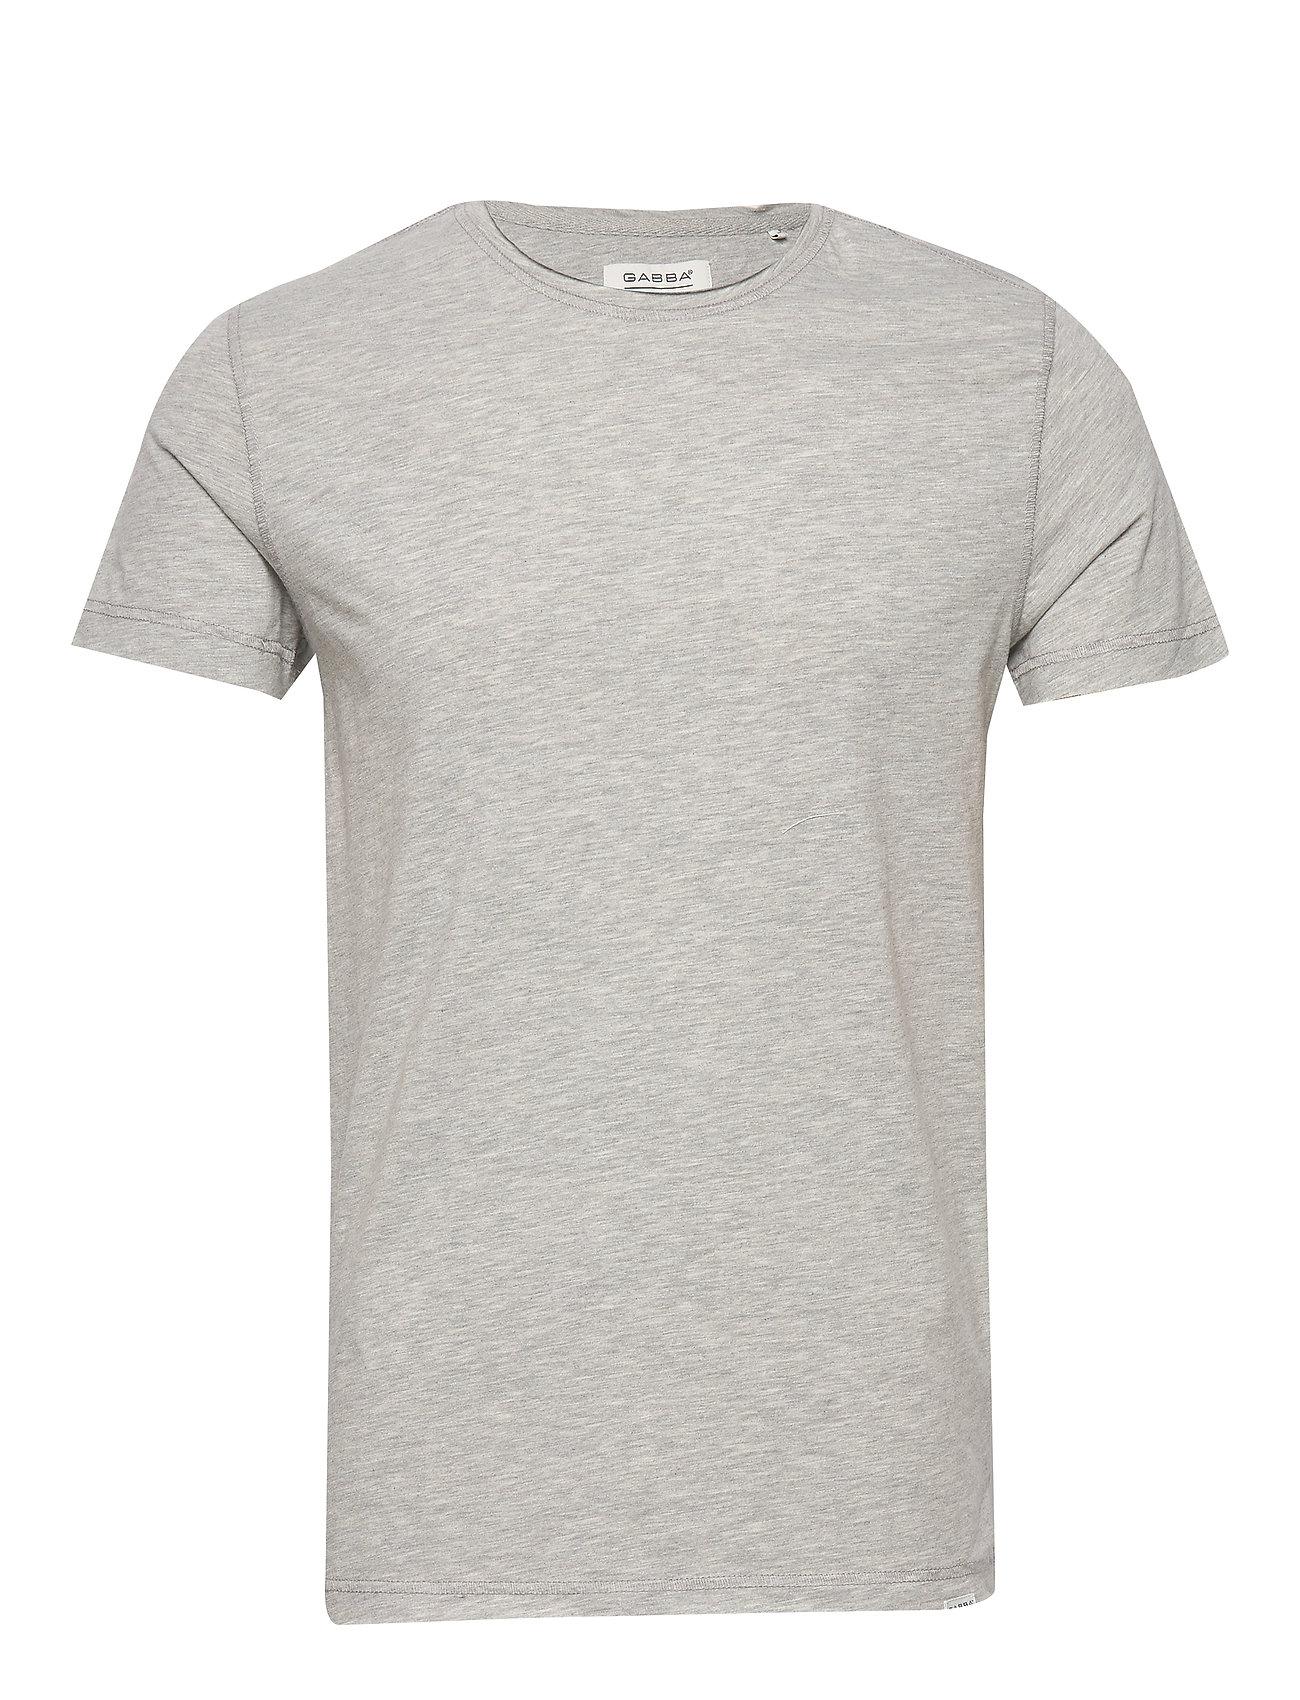 Image of Konrad Slub S/S Tee T-shirt Grå Gabba (3536400563)